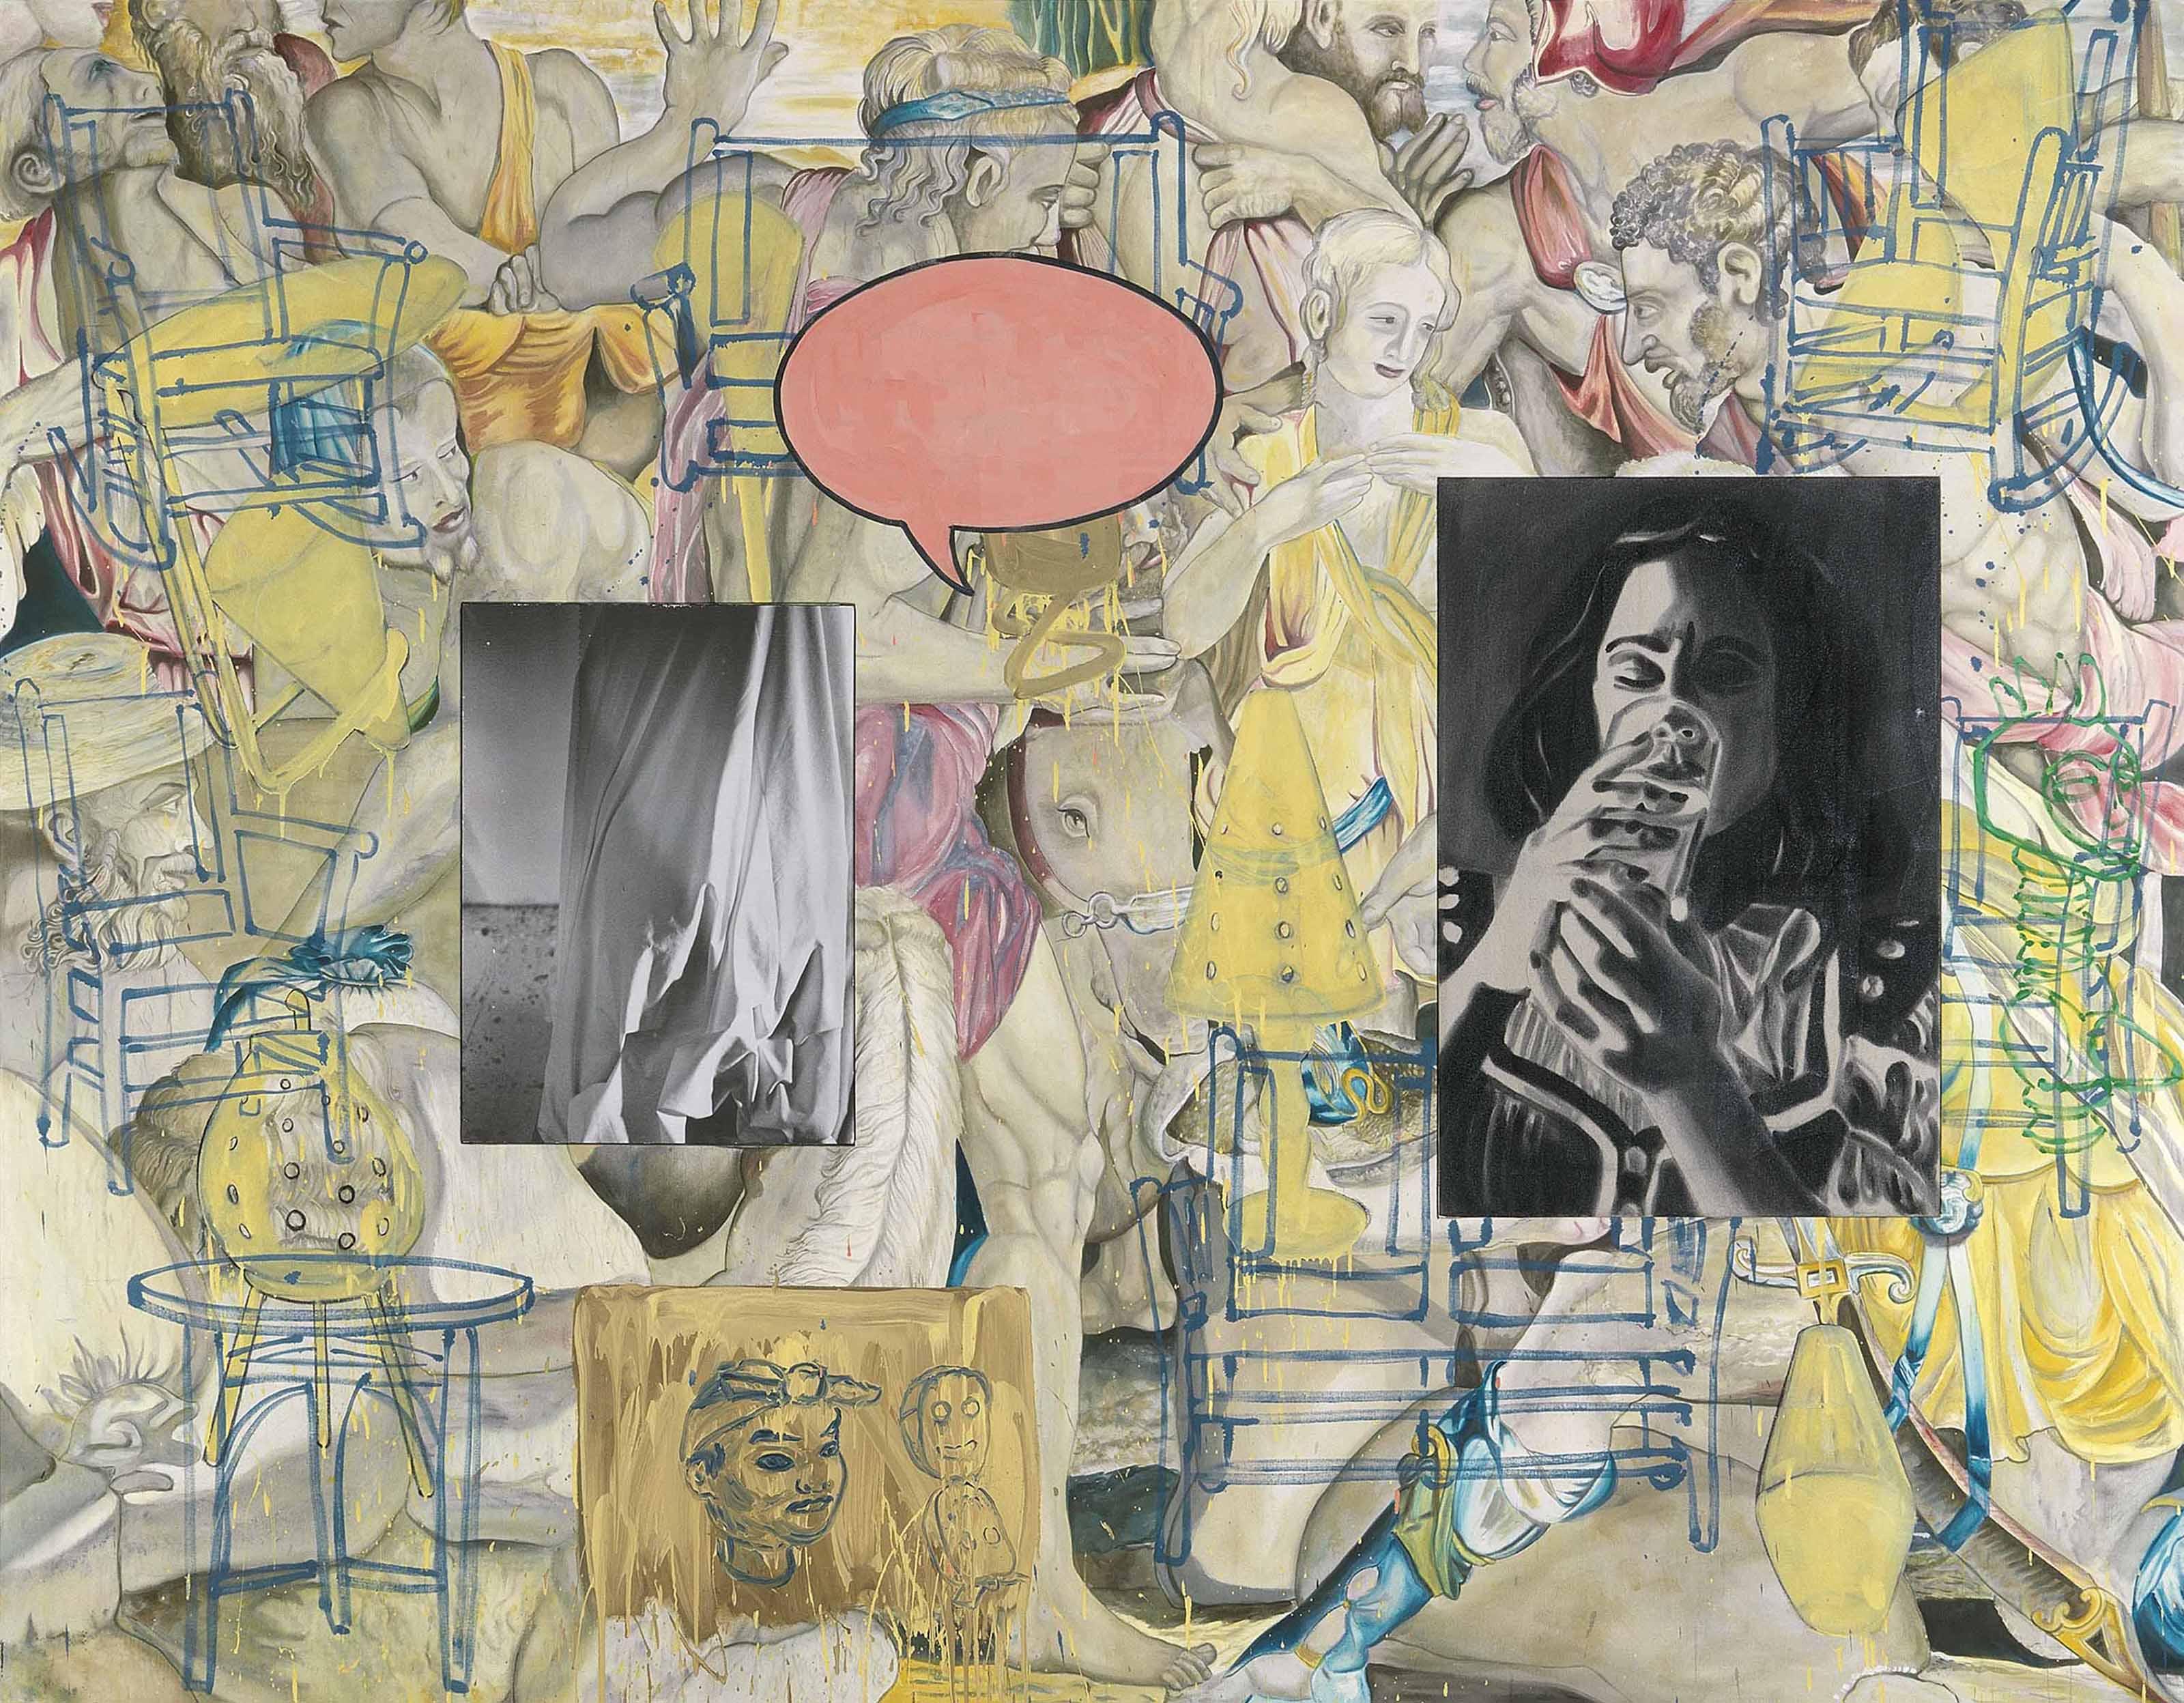 David Salle (b. 1952)